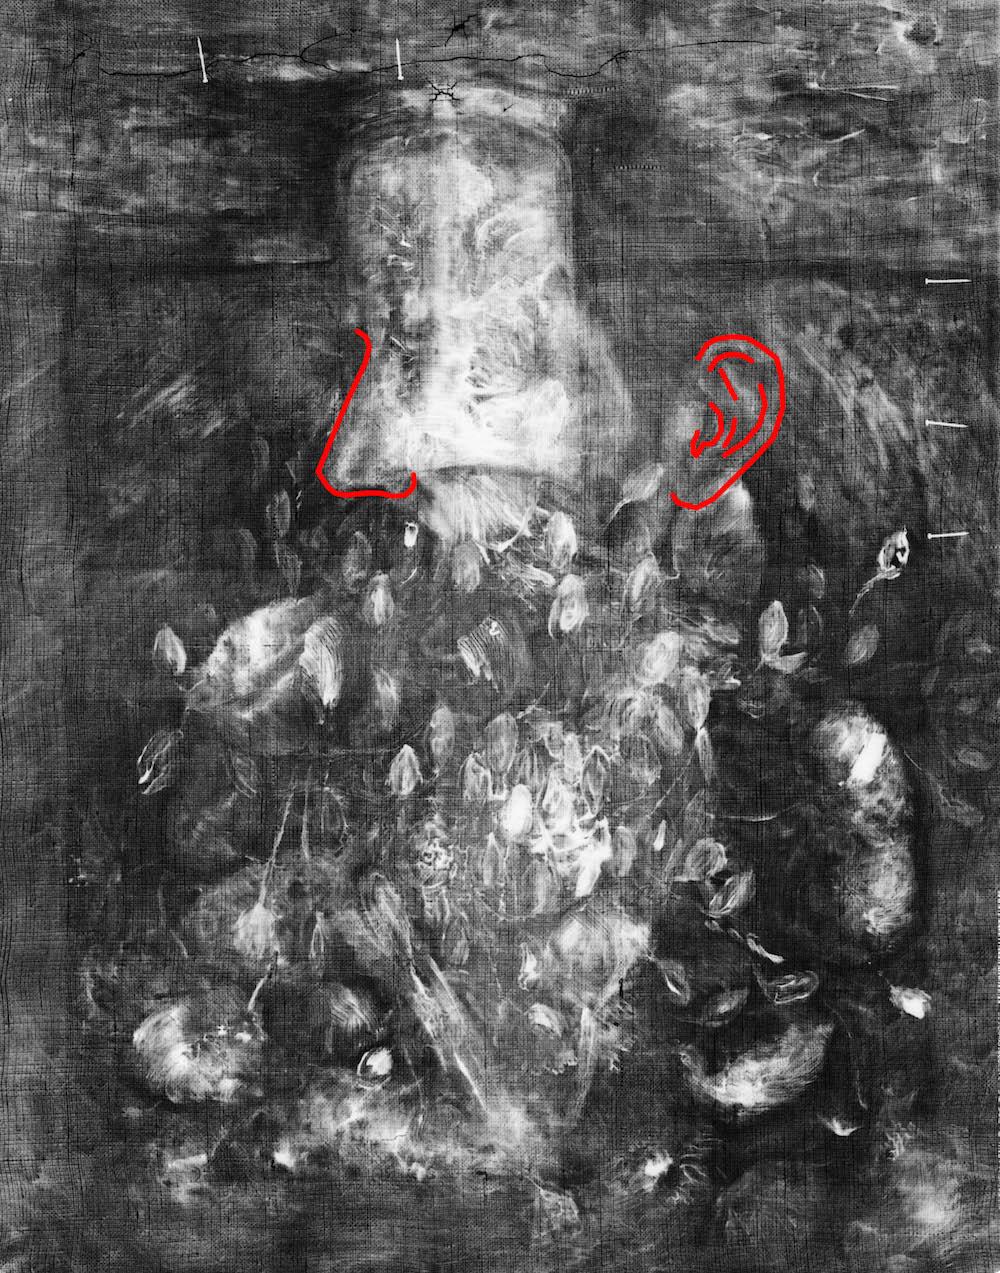 X Ray Image Of Van Gogh Painting